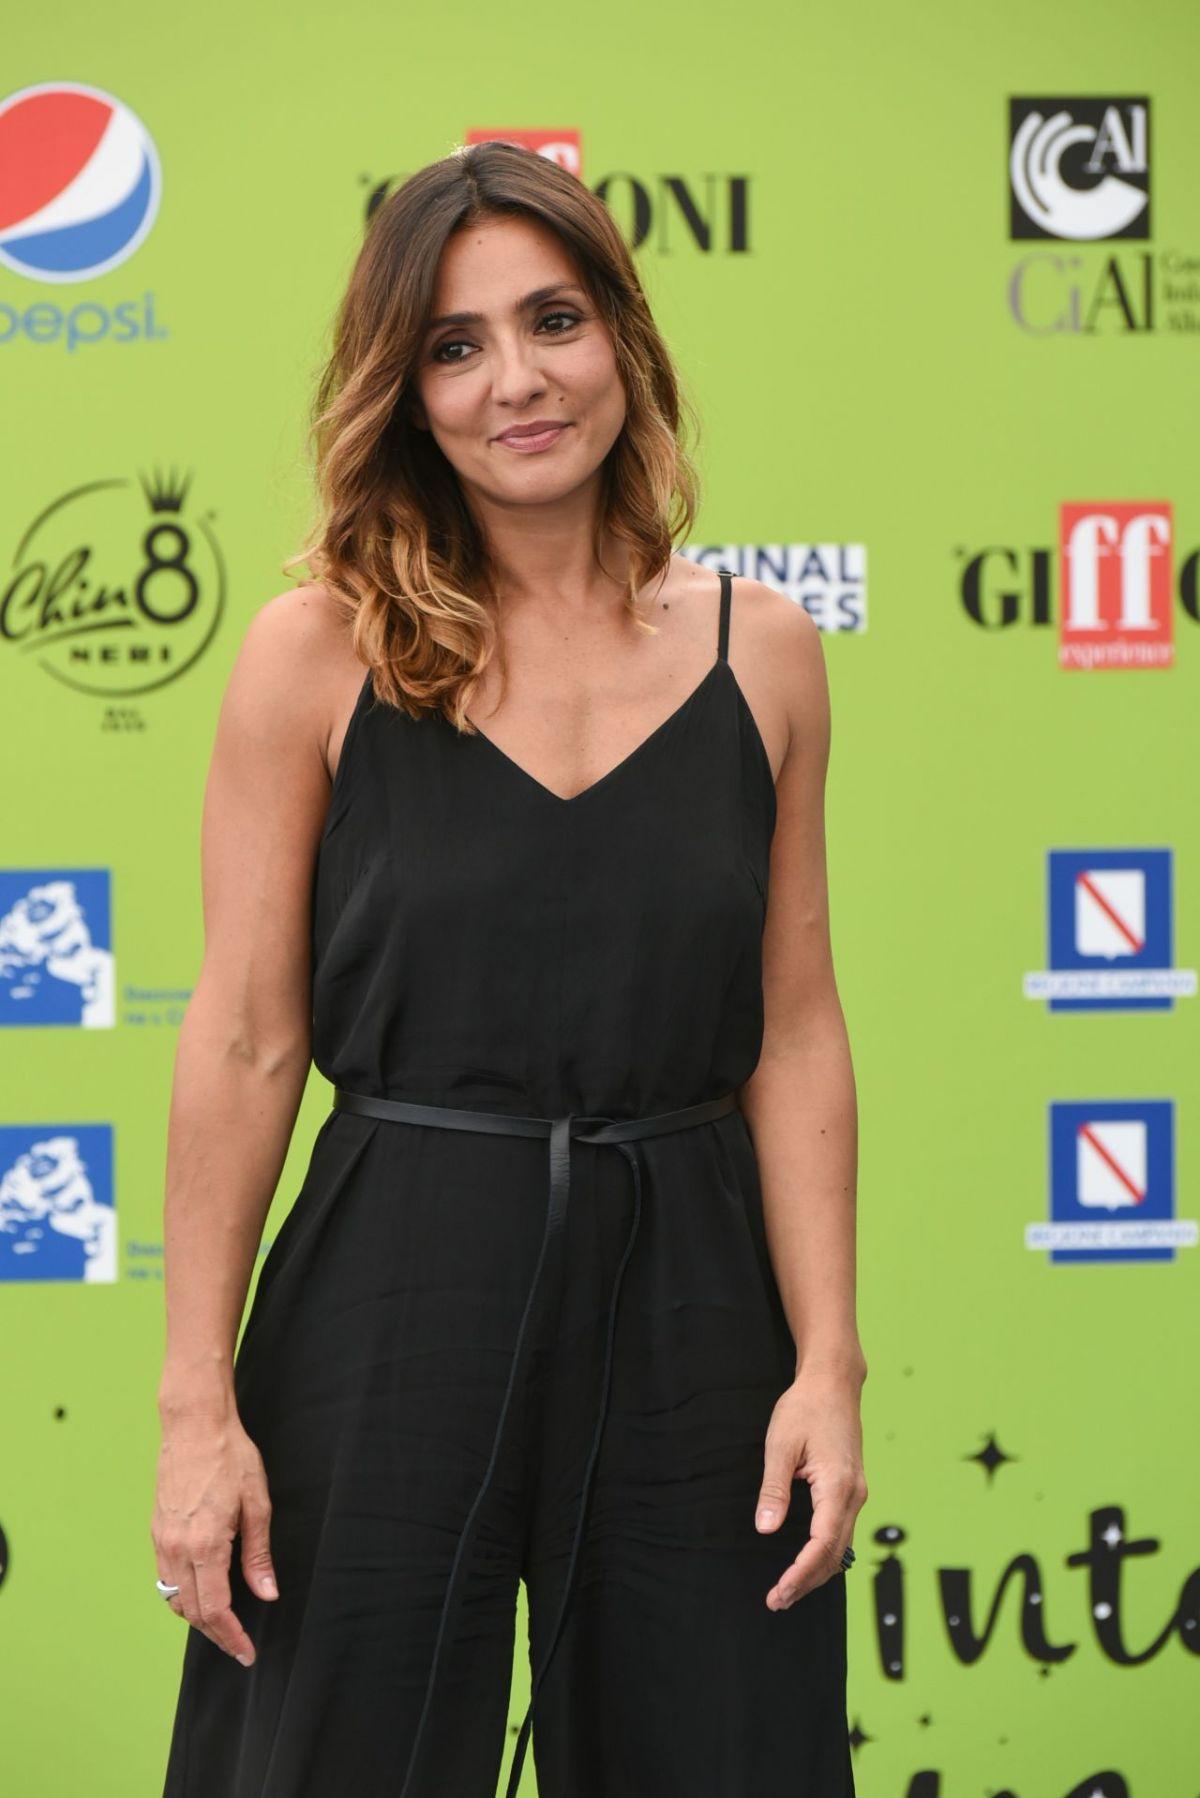 AMBRA ANGIOLINI at Giffoni Film Festival in Giffoni Valle Piana 07/21/2017